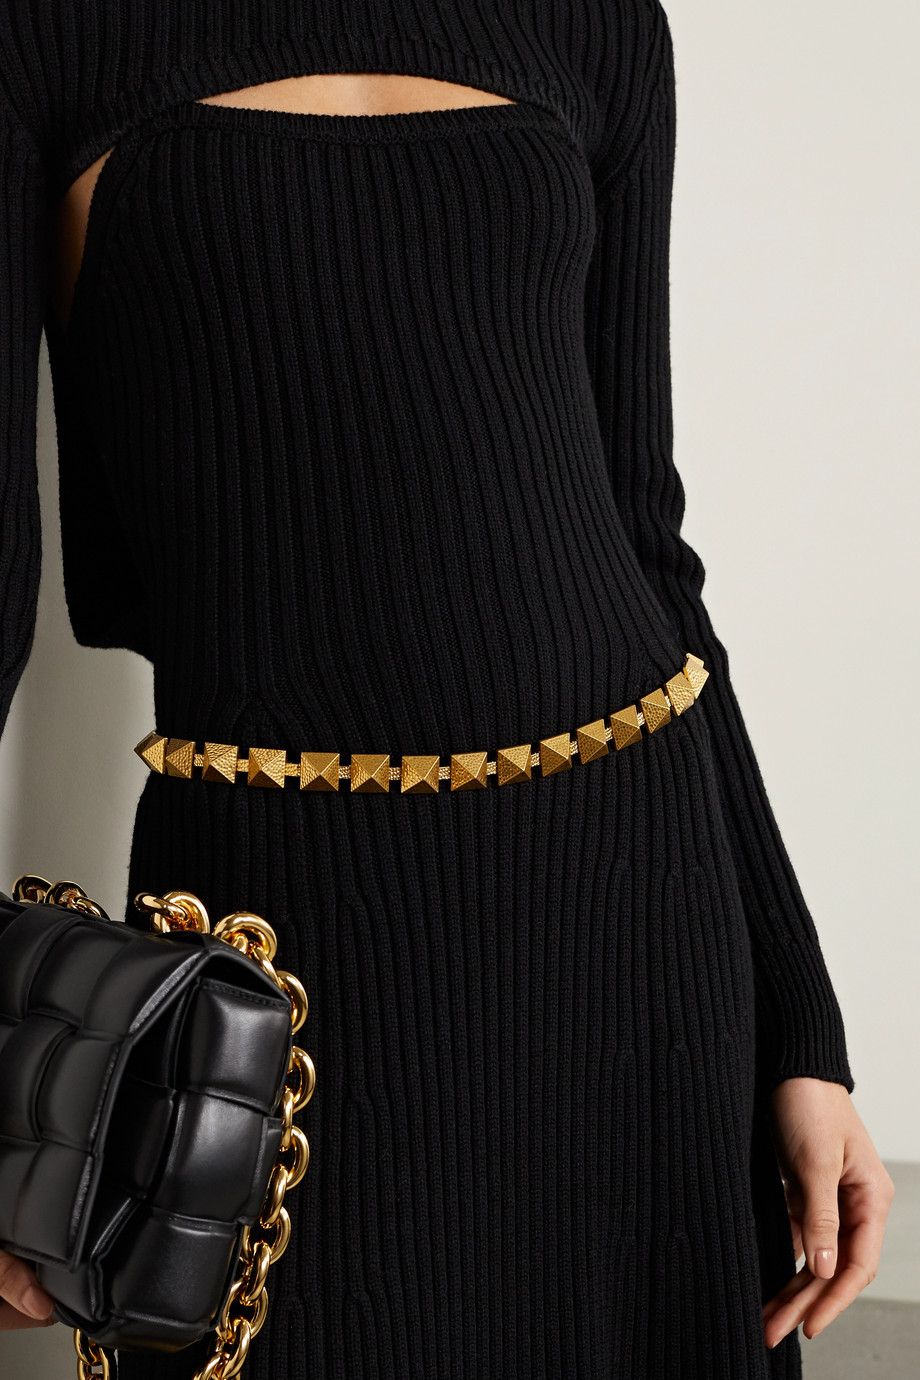 Valentino Valentino Garavani Roman studded gold-tone belt